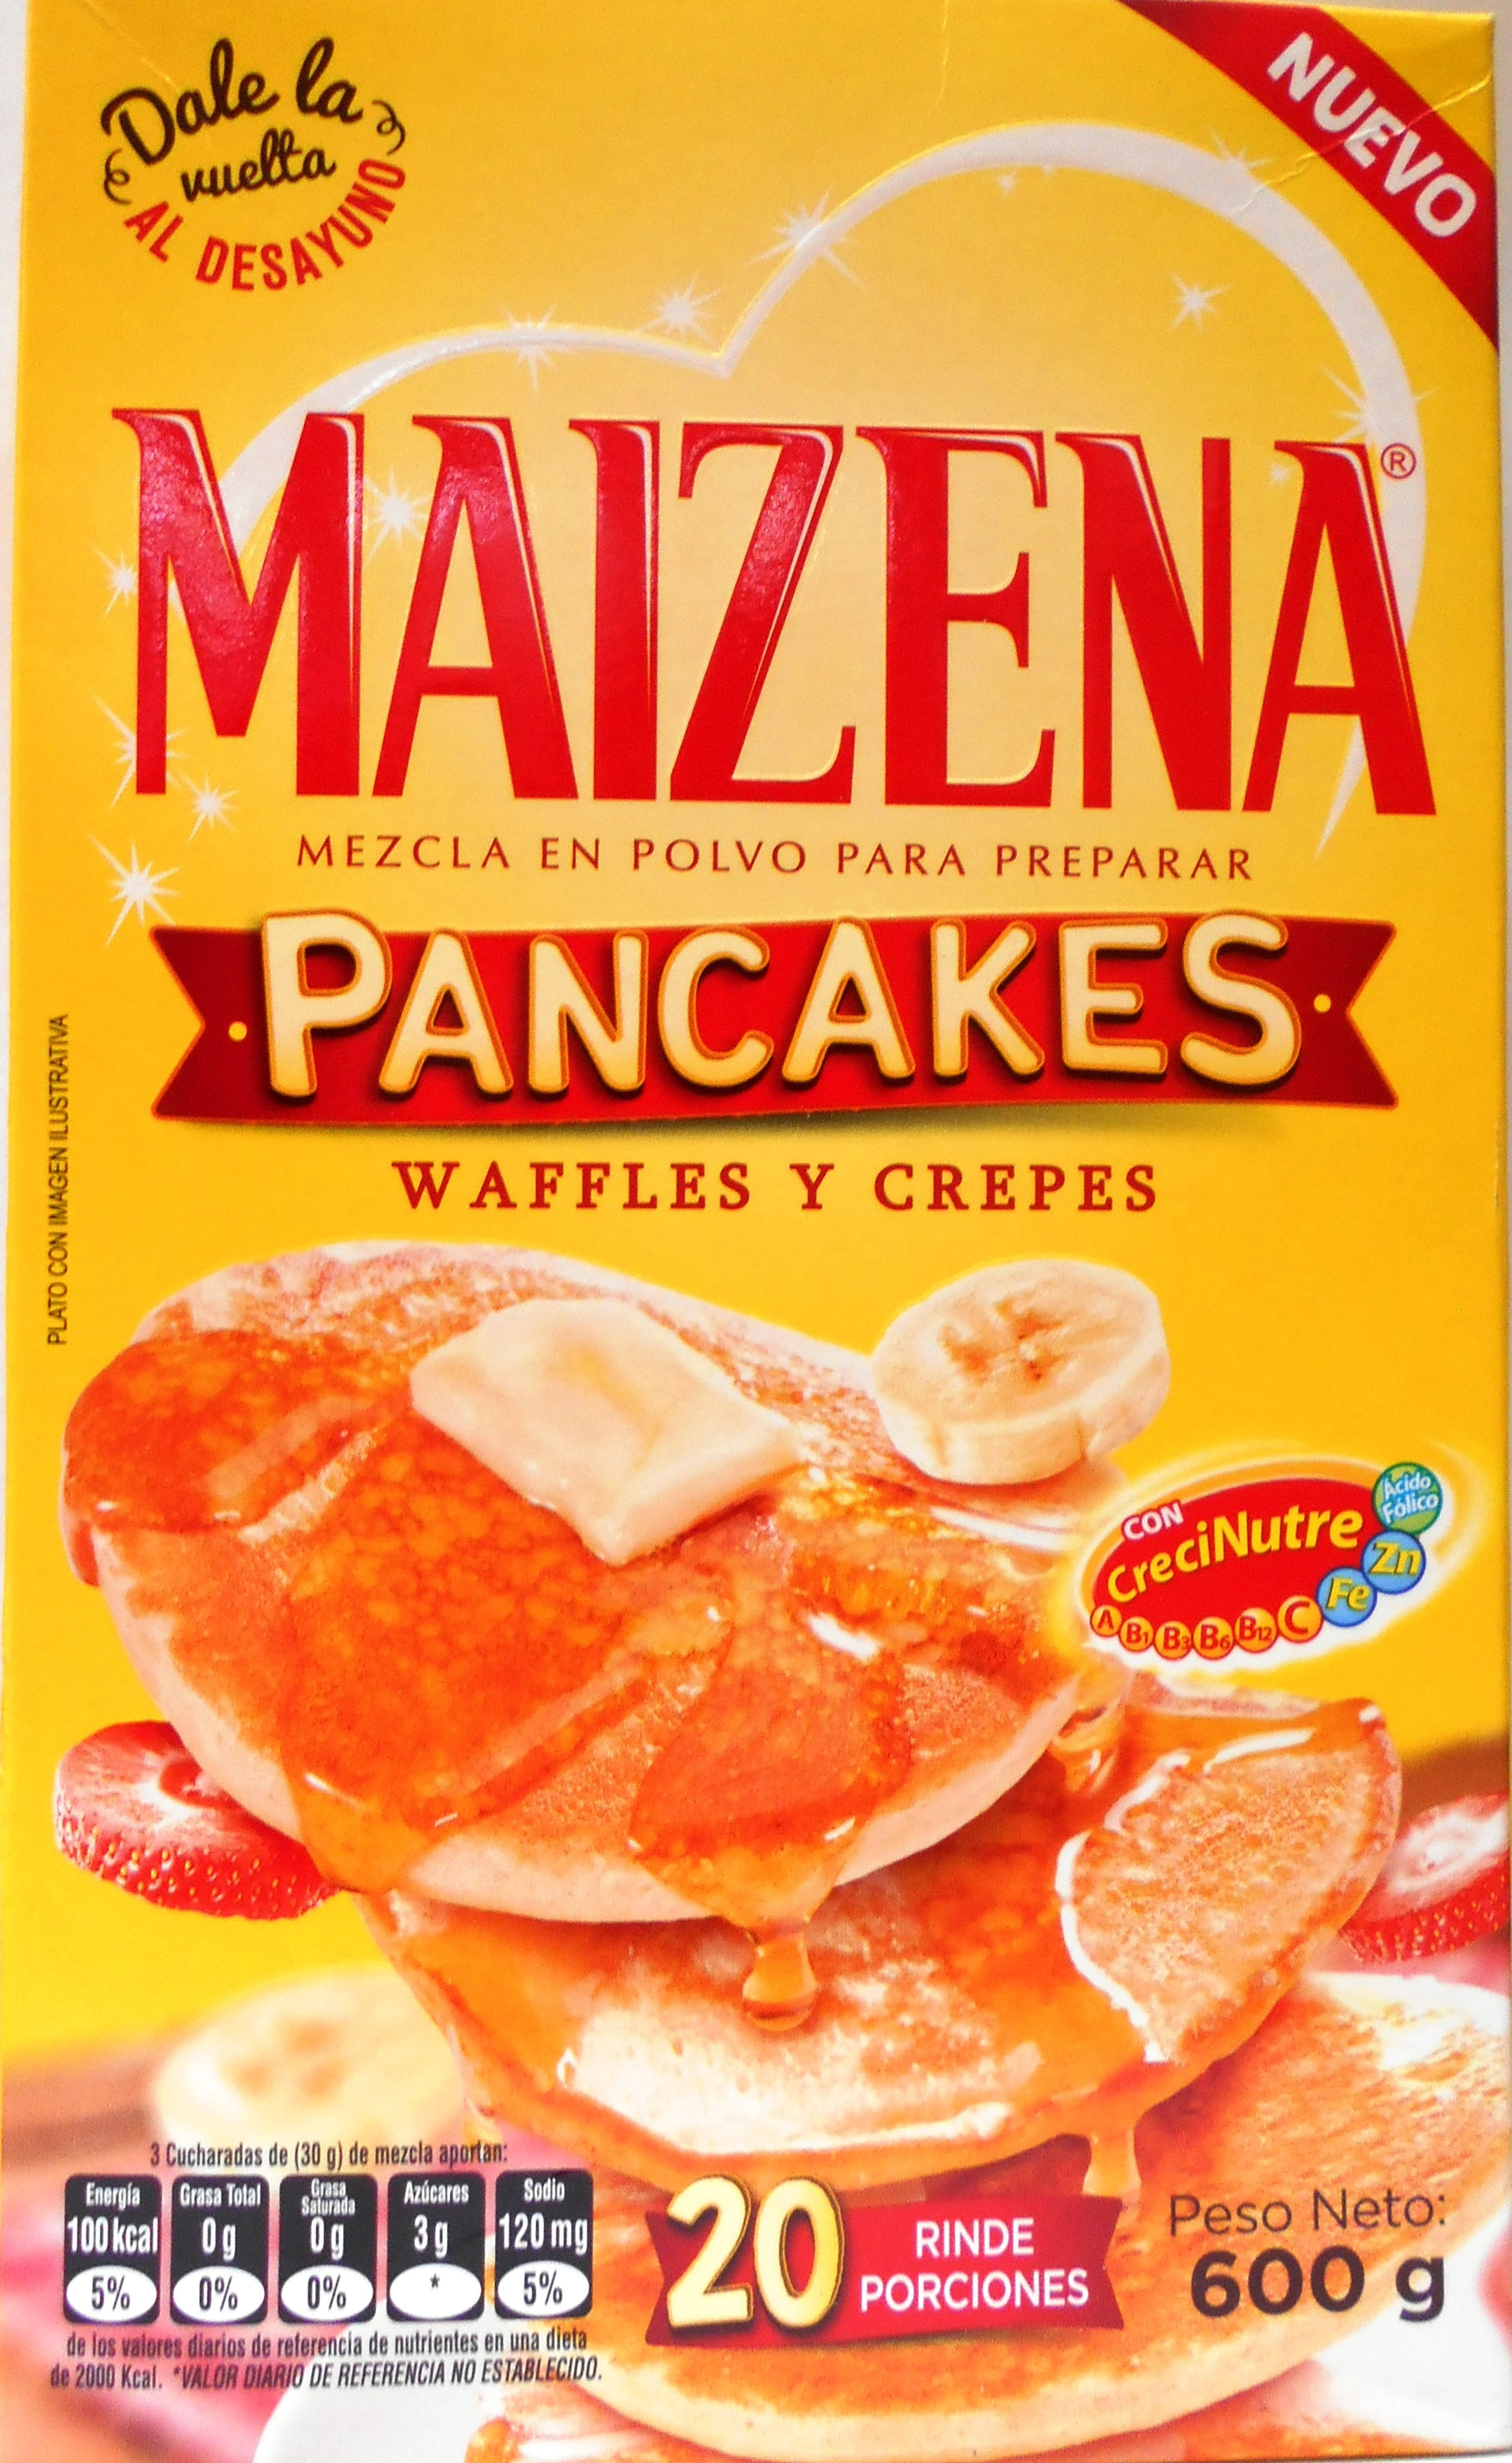 Mezcla Pancakes Maizena 600g